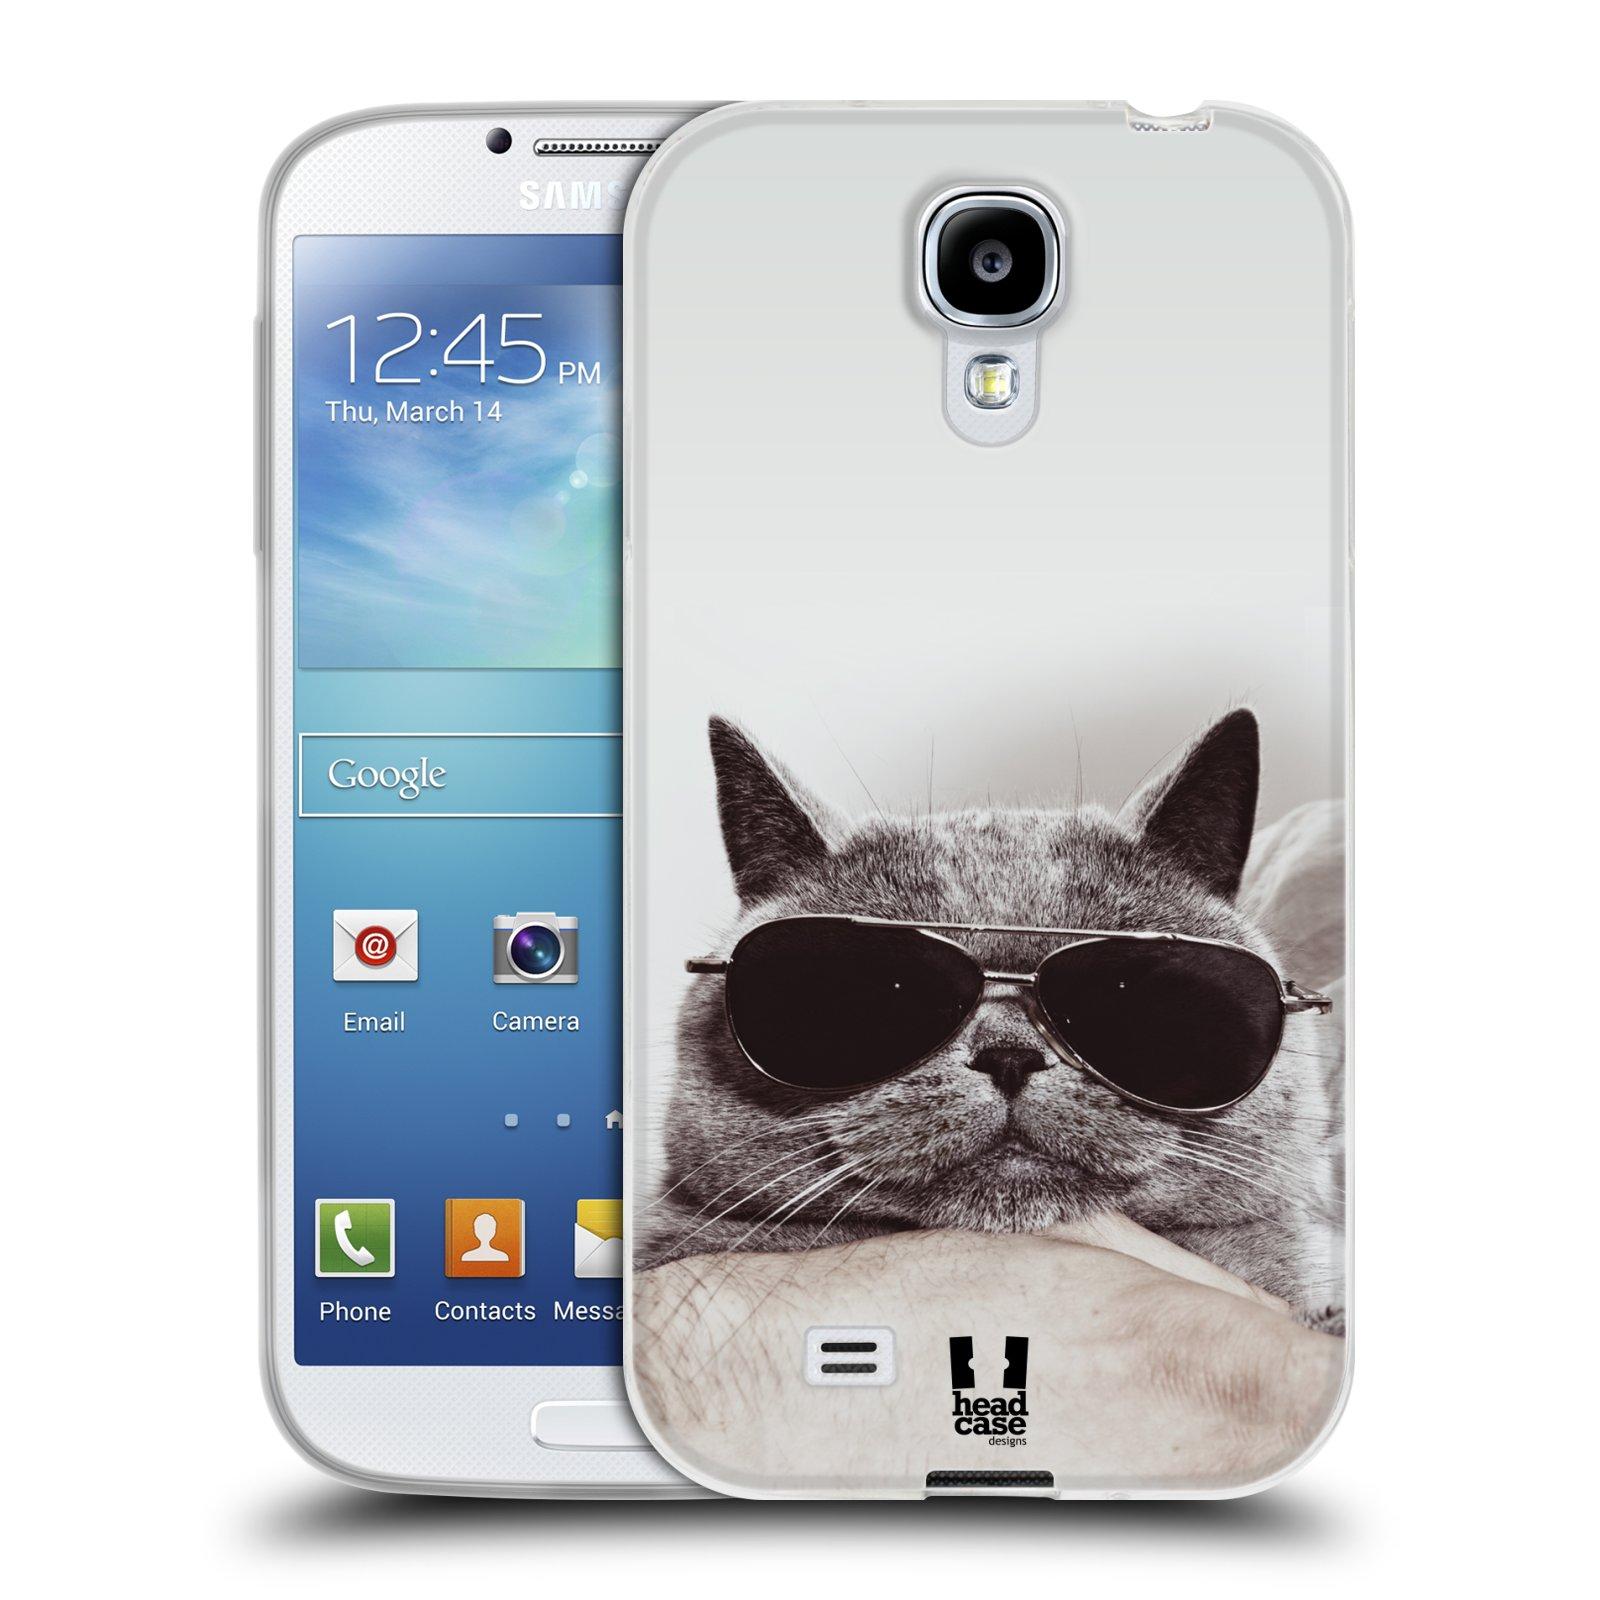 Silikonové pouzdro na mobil Samsung Galaxy S4 HEAD CASE KOTĚ S BRÝLEMI (Silikonový kryt či obal na mobilní telefon Samsung Galaxy S4 GT-i9505 / i9500)